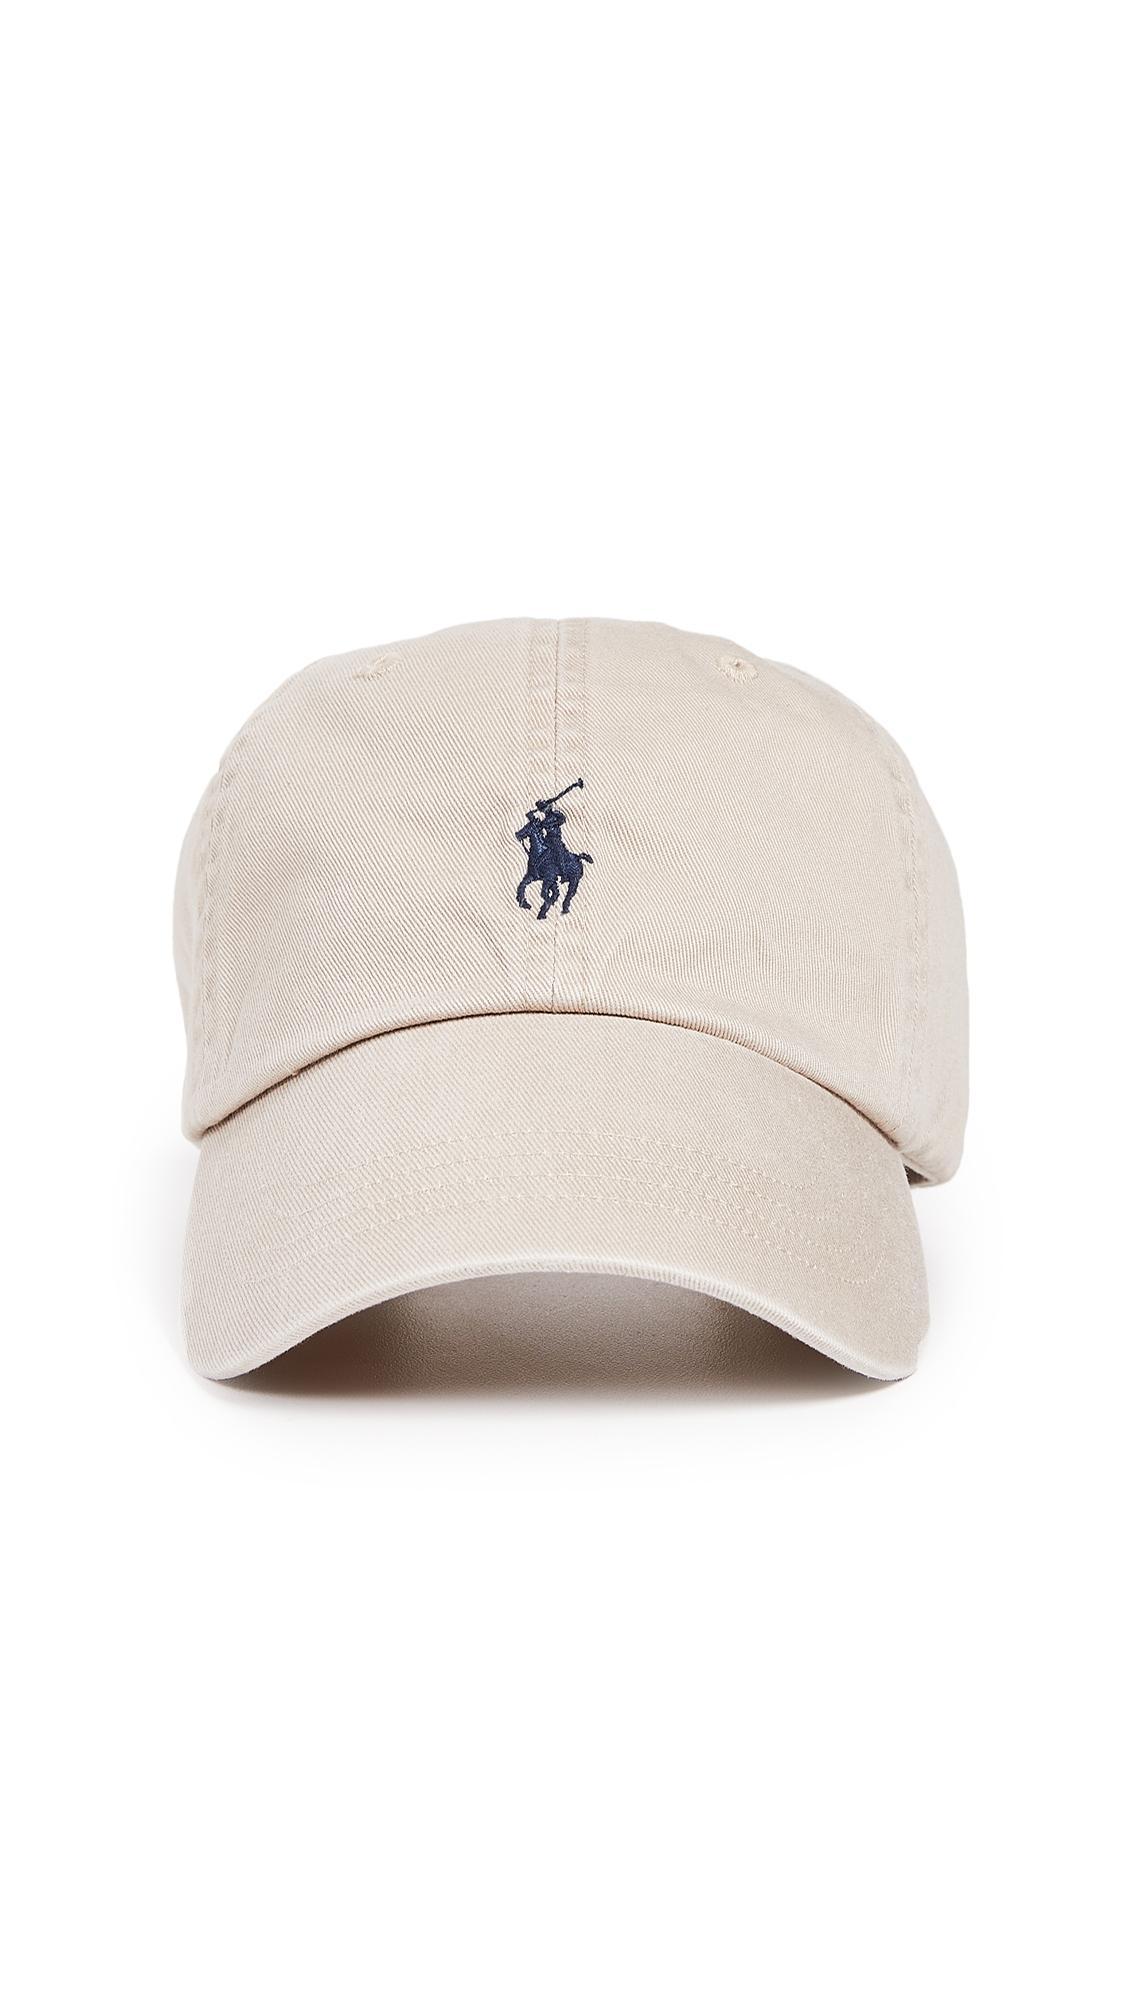 d5908442e Polo Ralph Lauren Classic Pony Cap In Nubuck/Navy | ModeSens